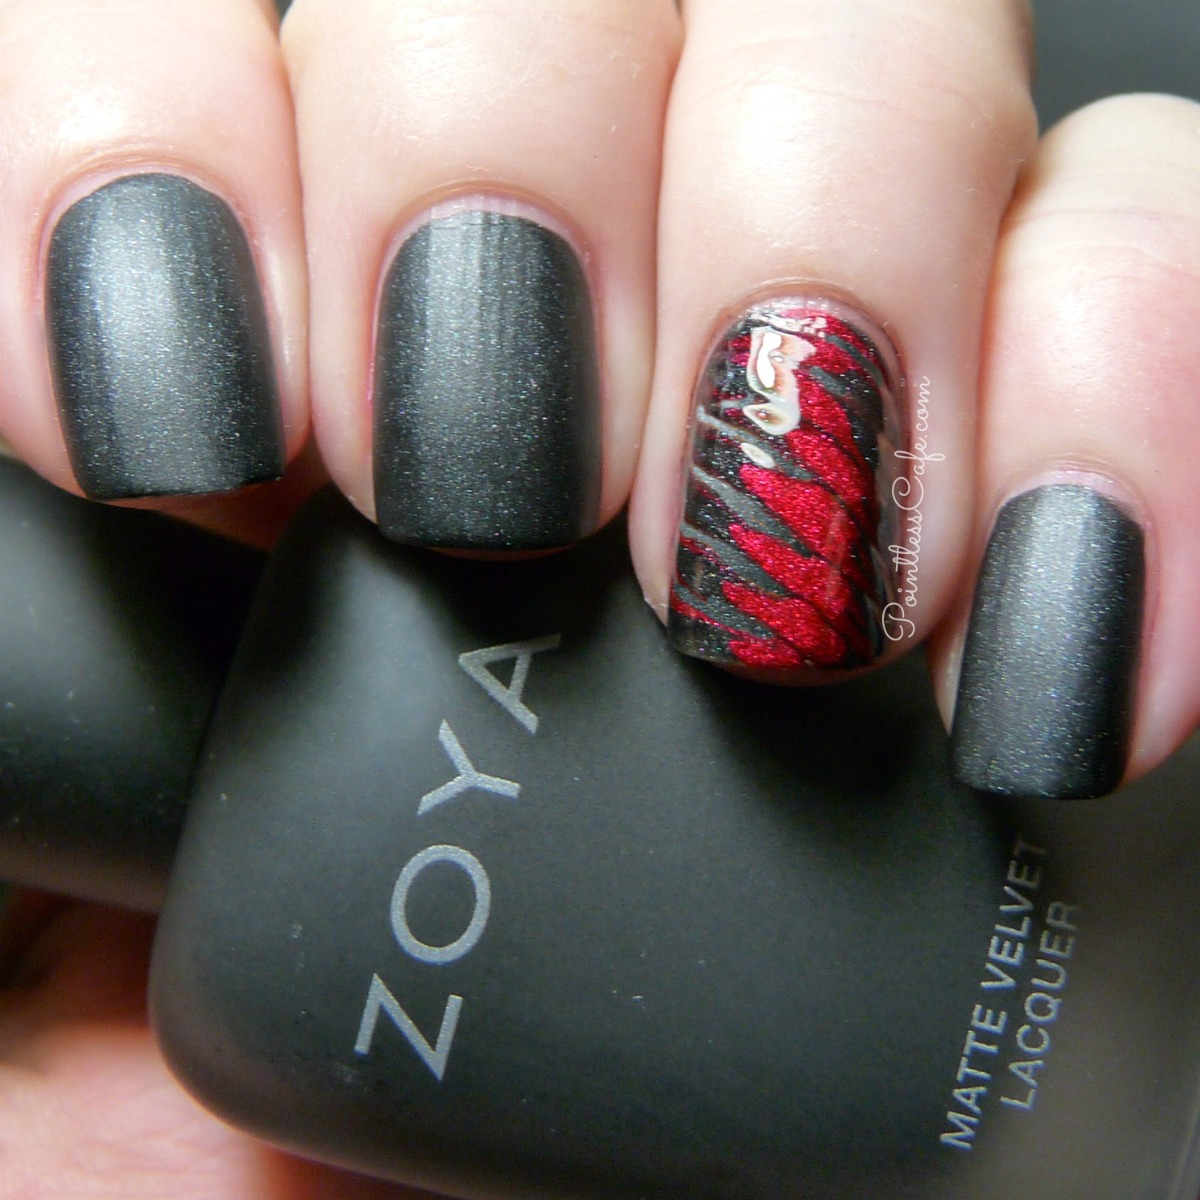 Zoya Matte Velvet Collection: LE For Holiday 2014